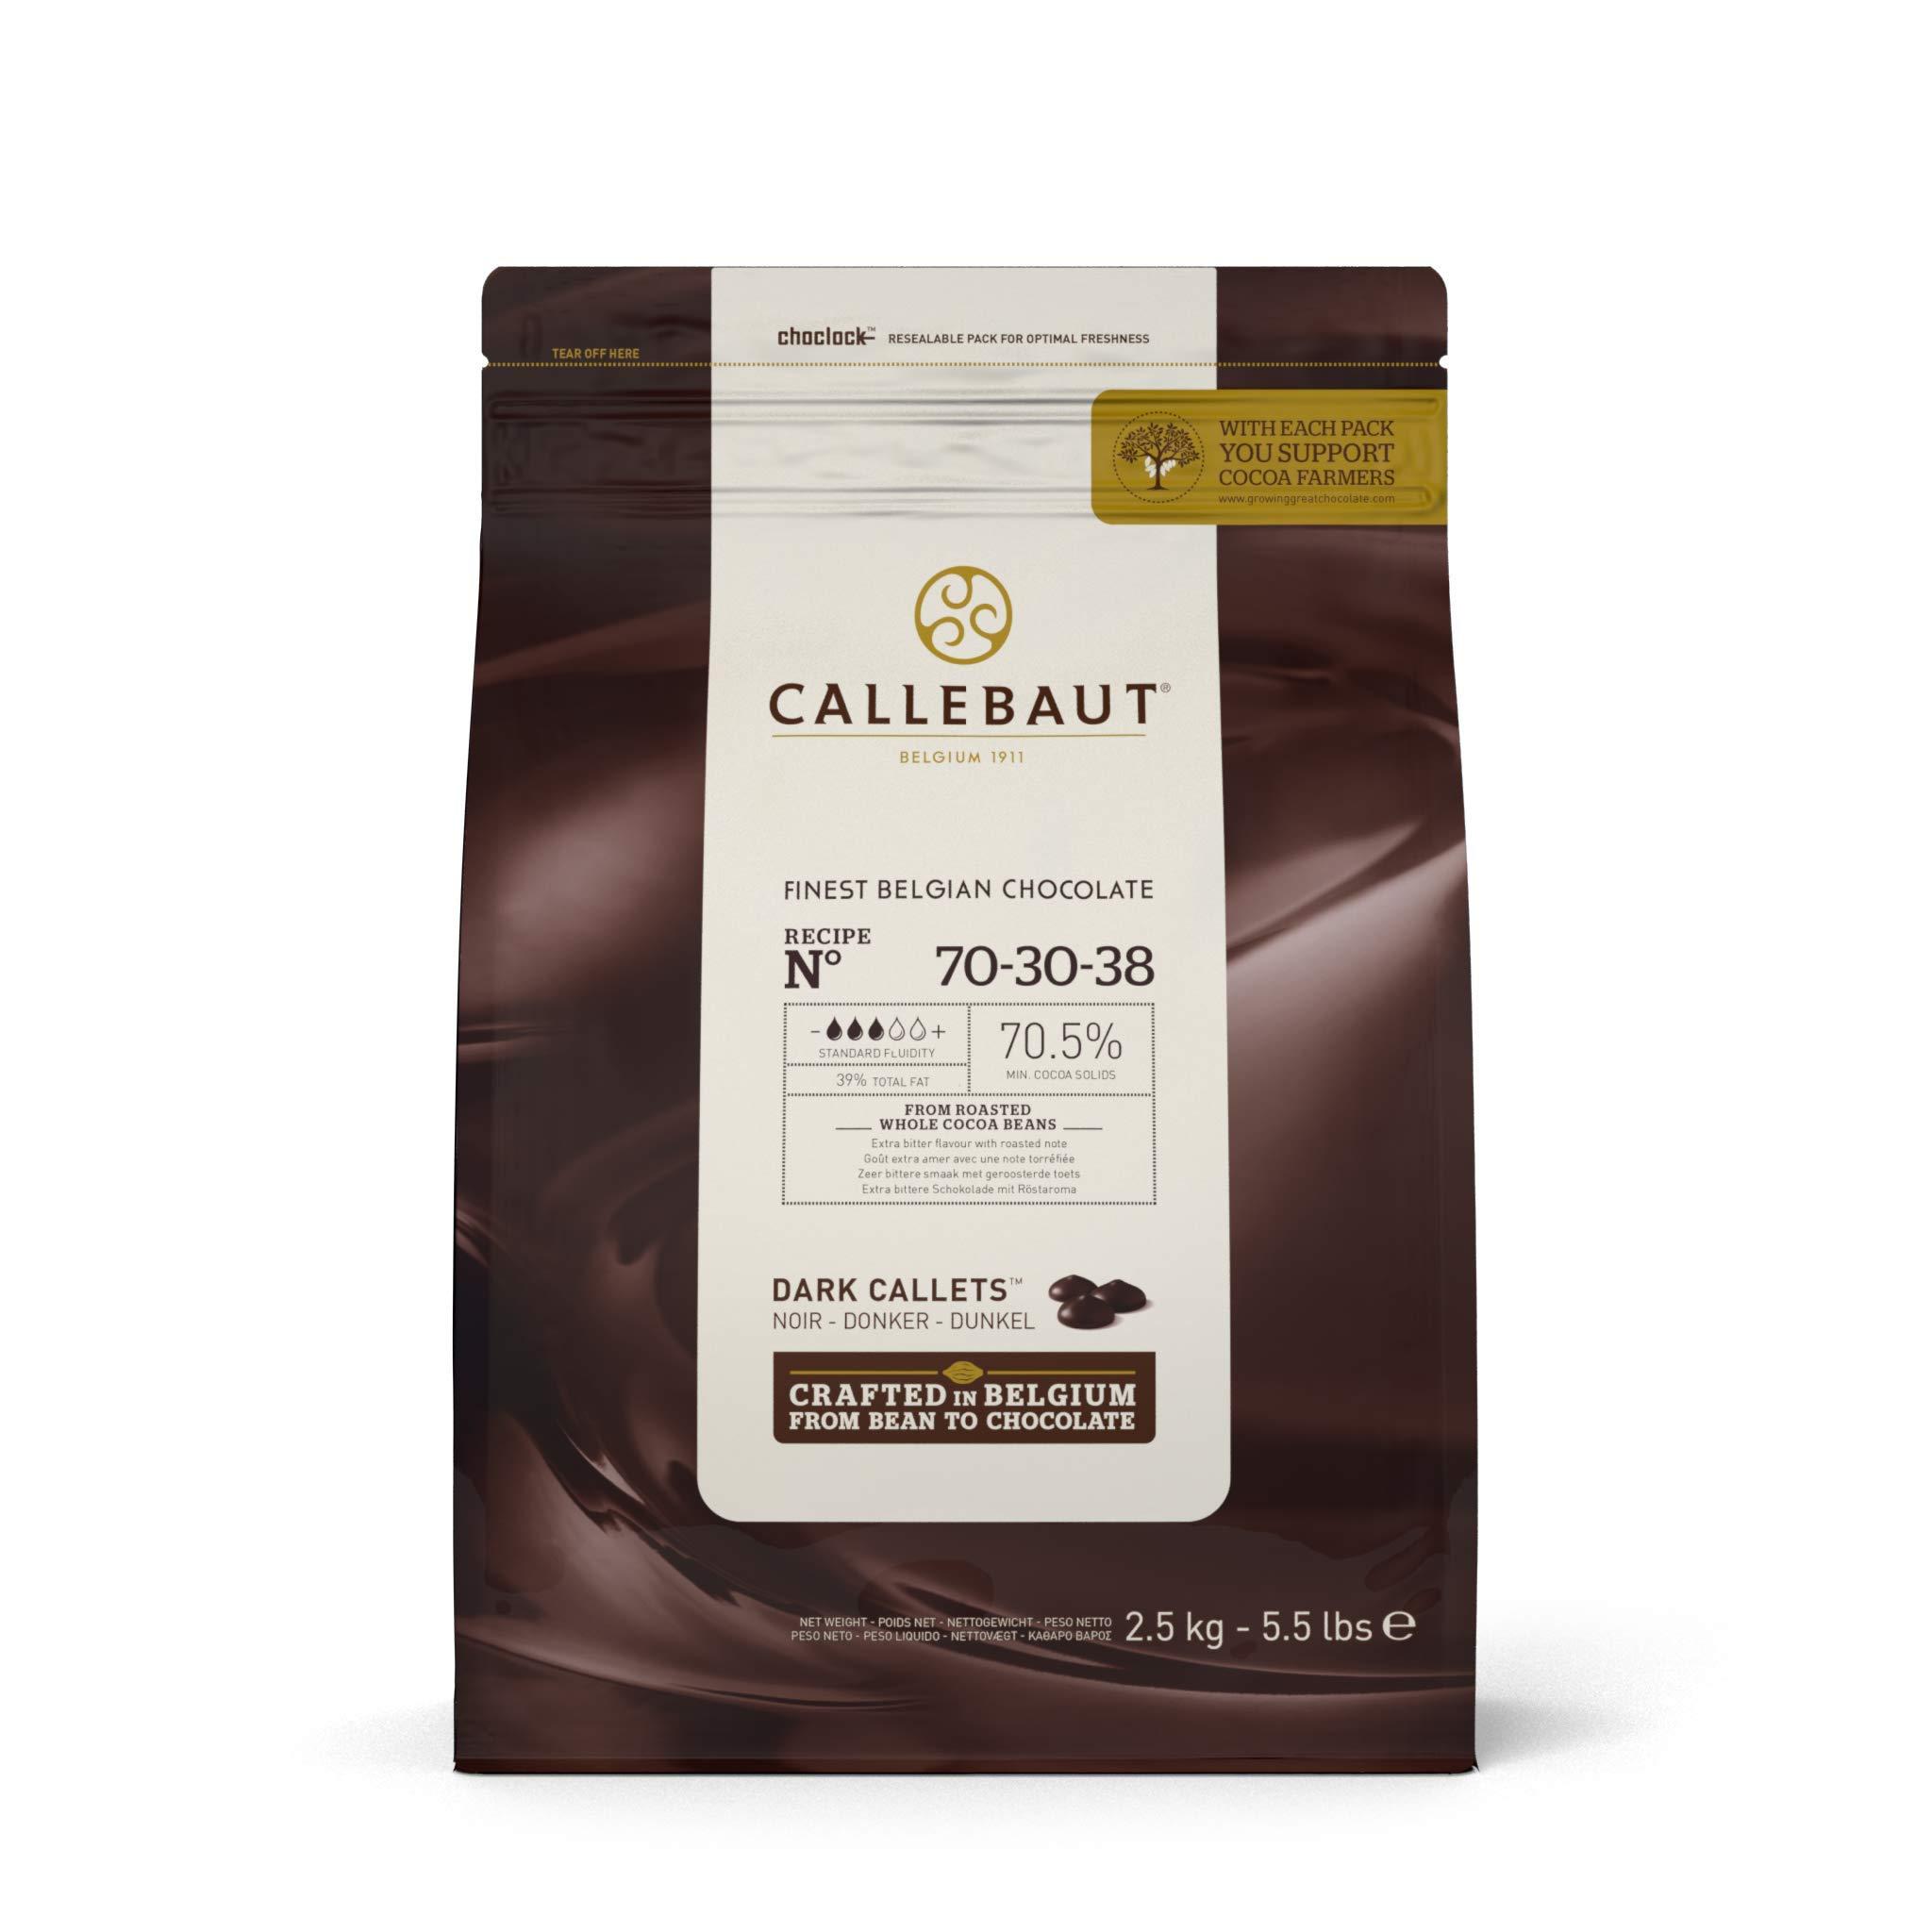 Callebaut 70,4% pepitas de Chocolate Negro (callets) 2.5kg product image